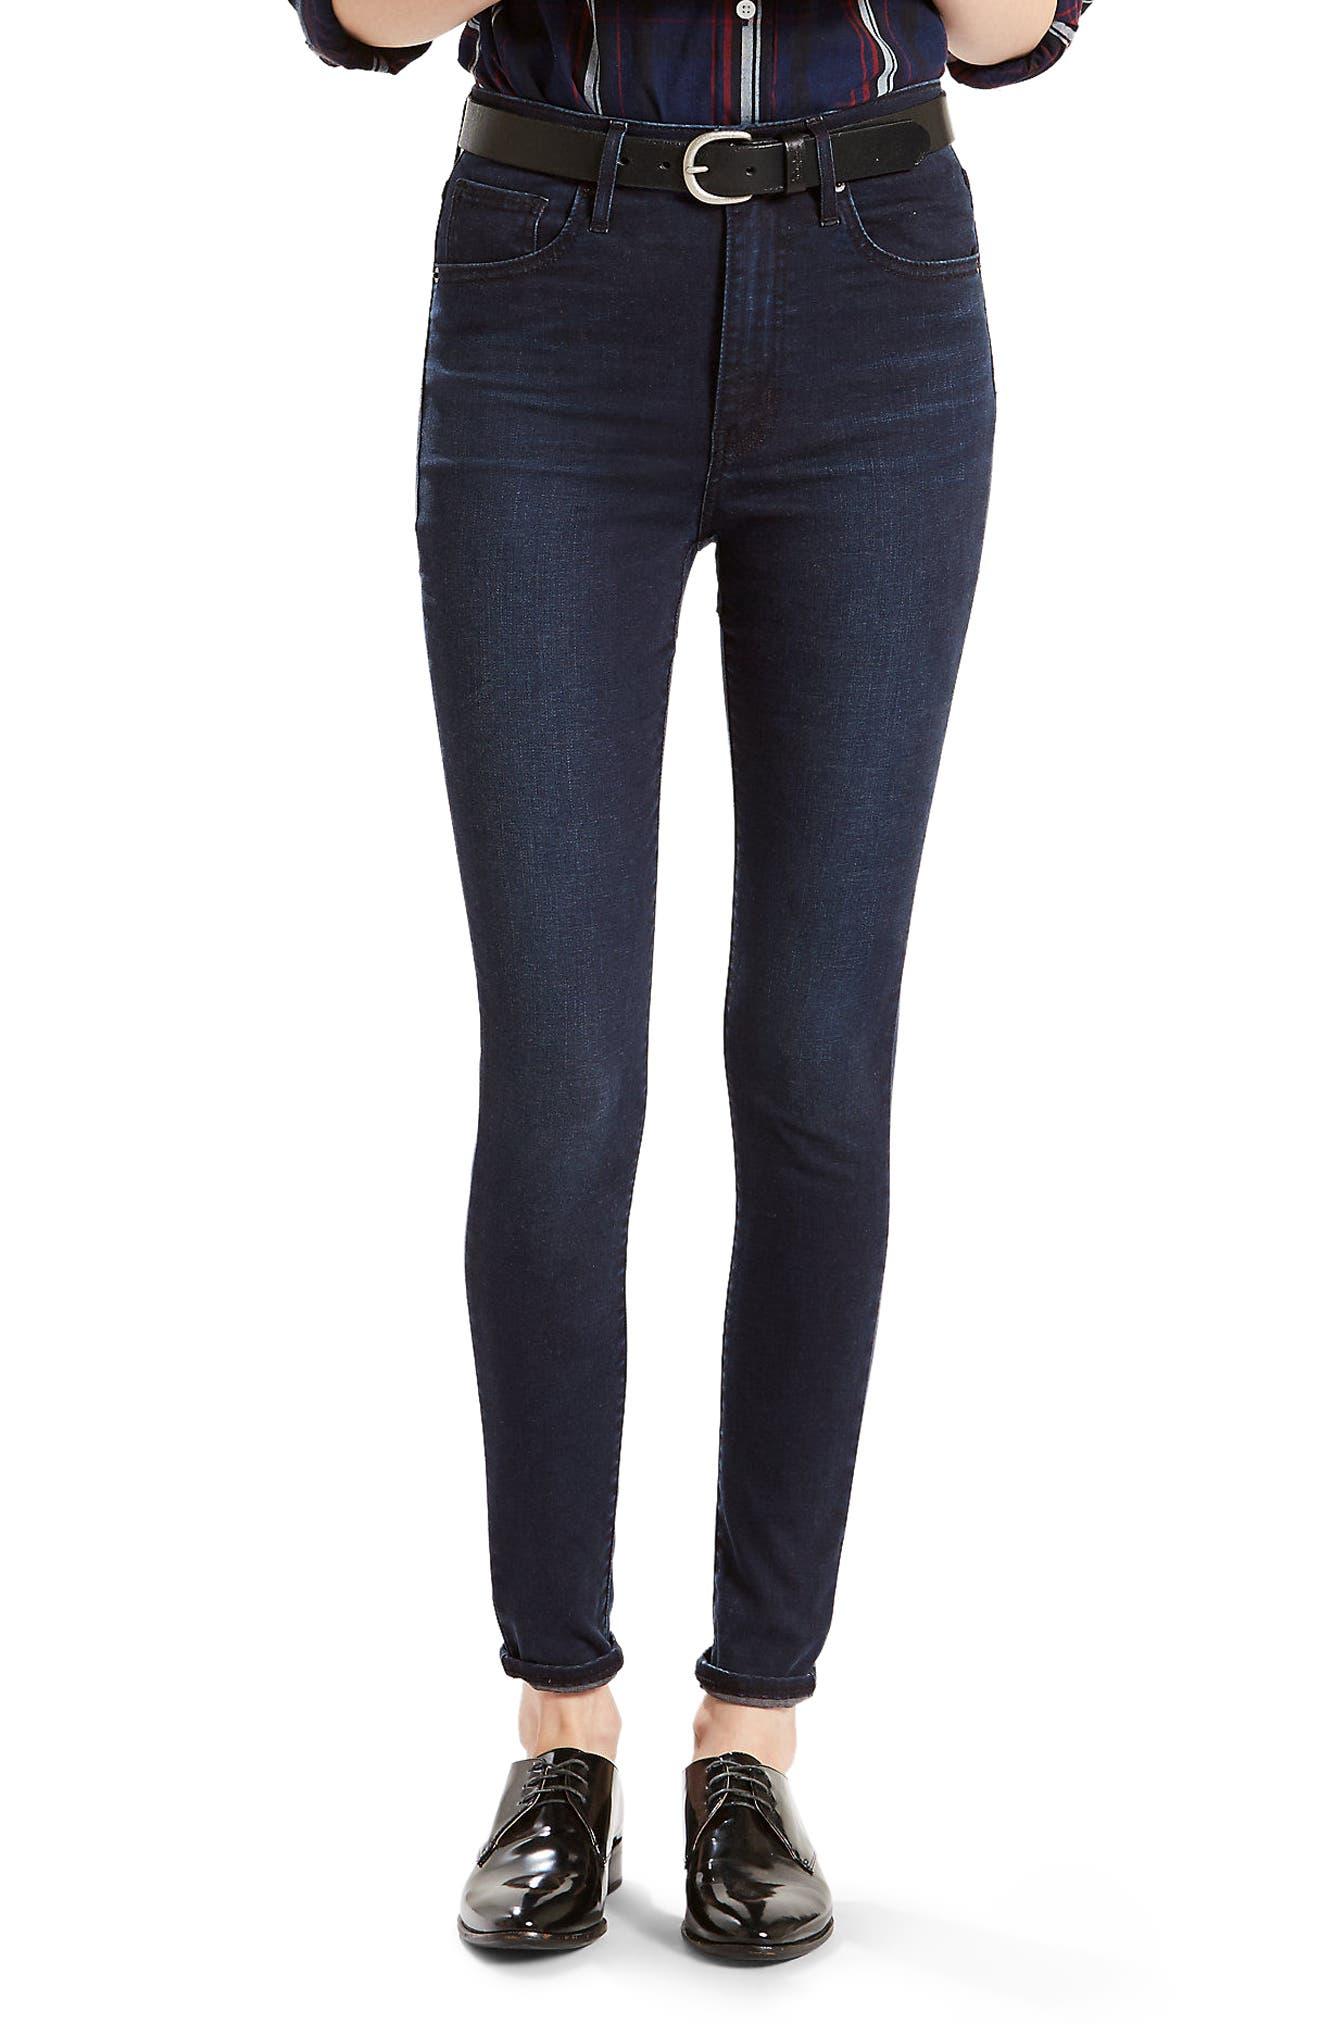 Alternate Image 1 Selected - Levi's® Mile High High Waist Super Skinny Jeans (Red Wonder)